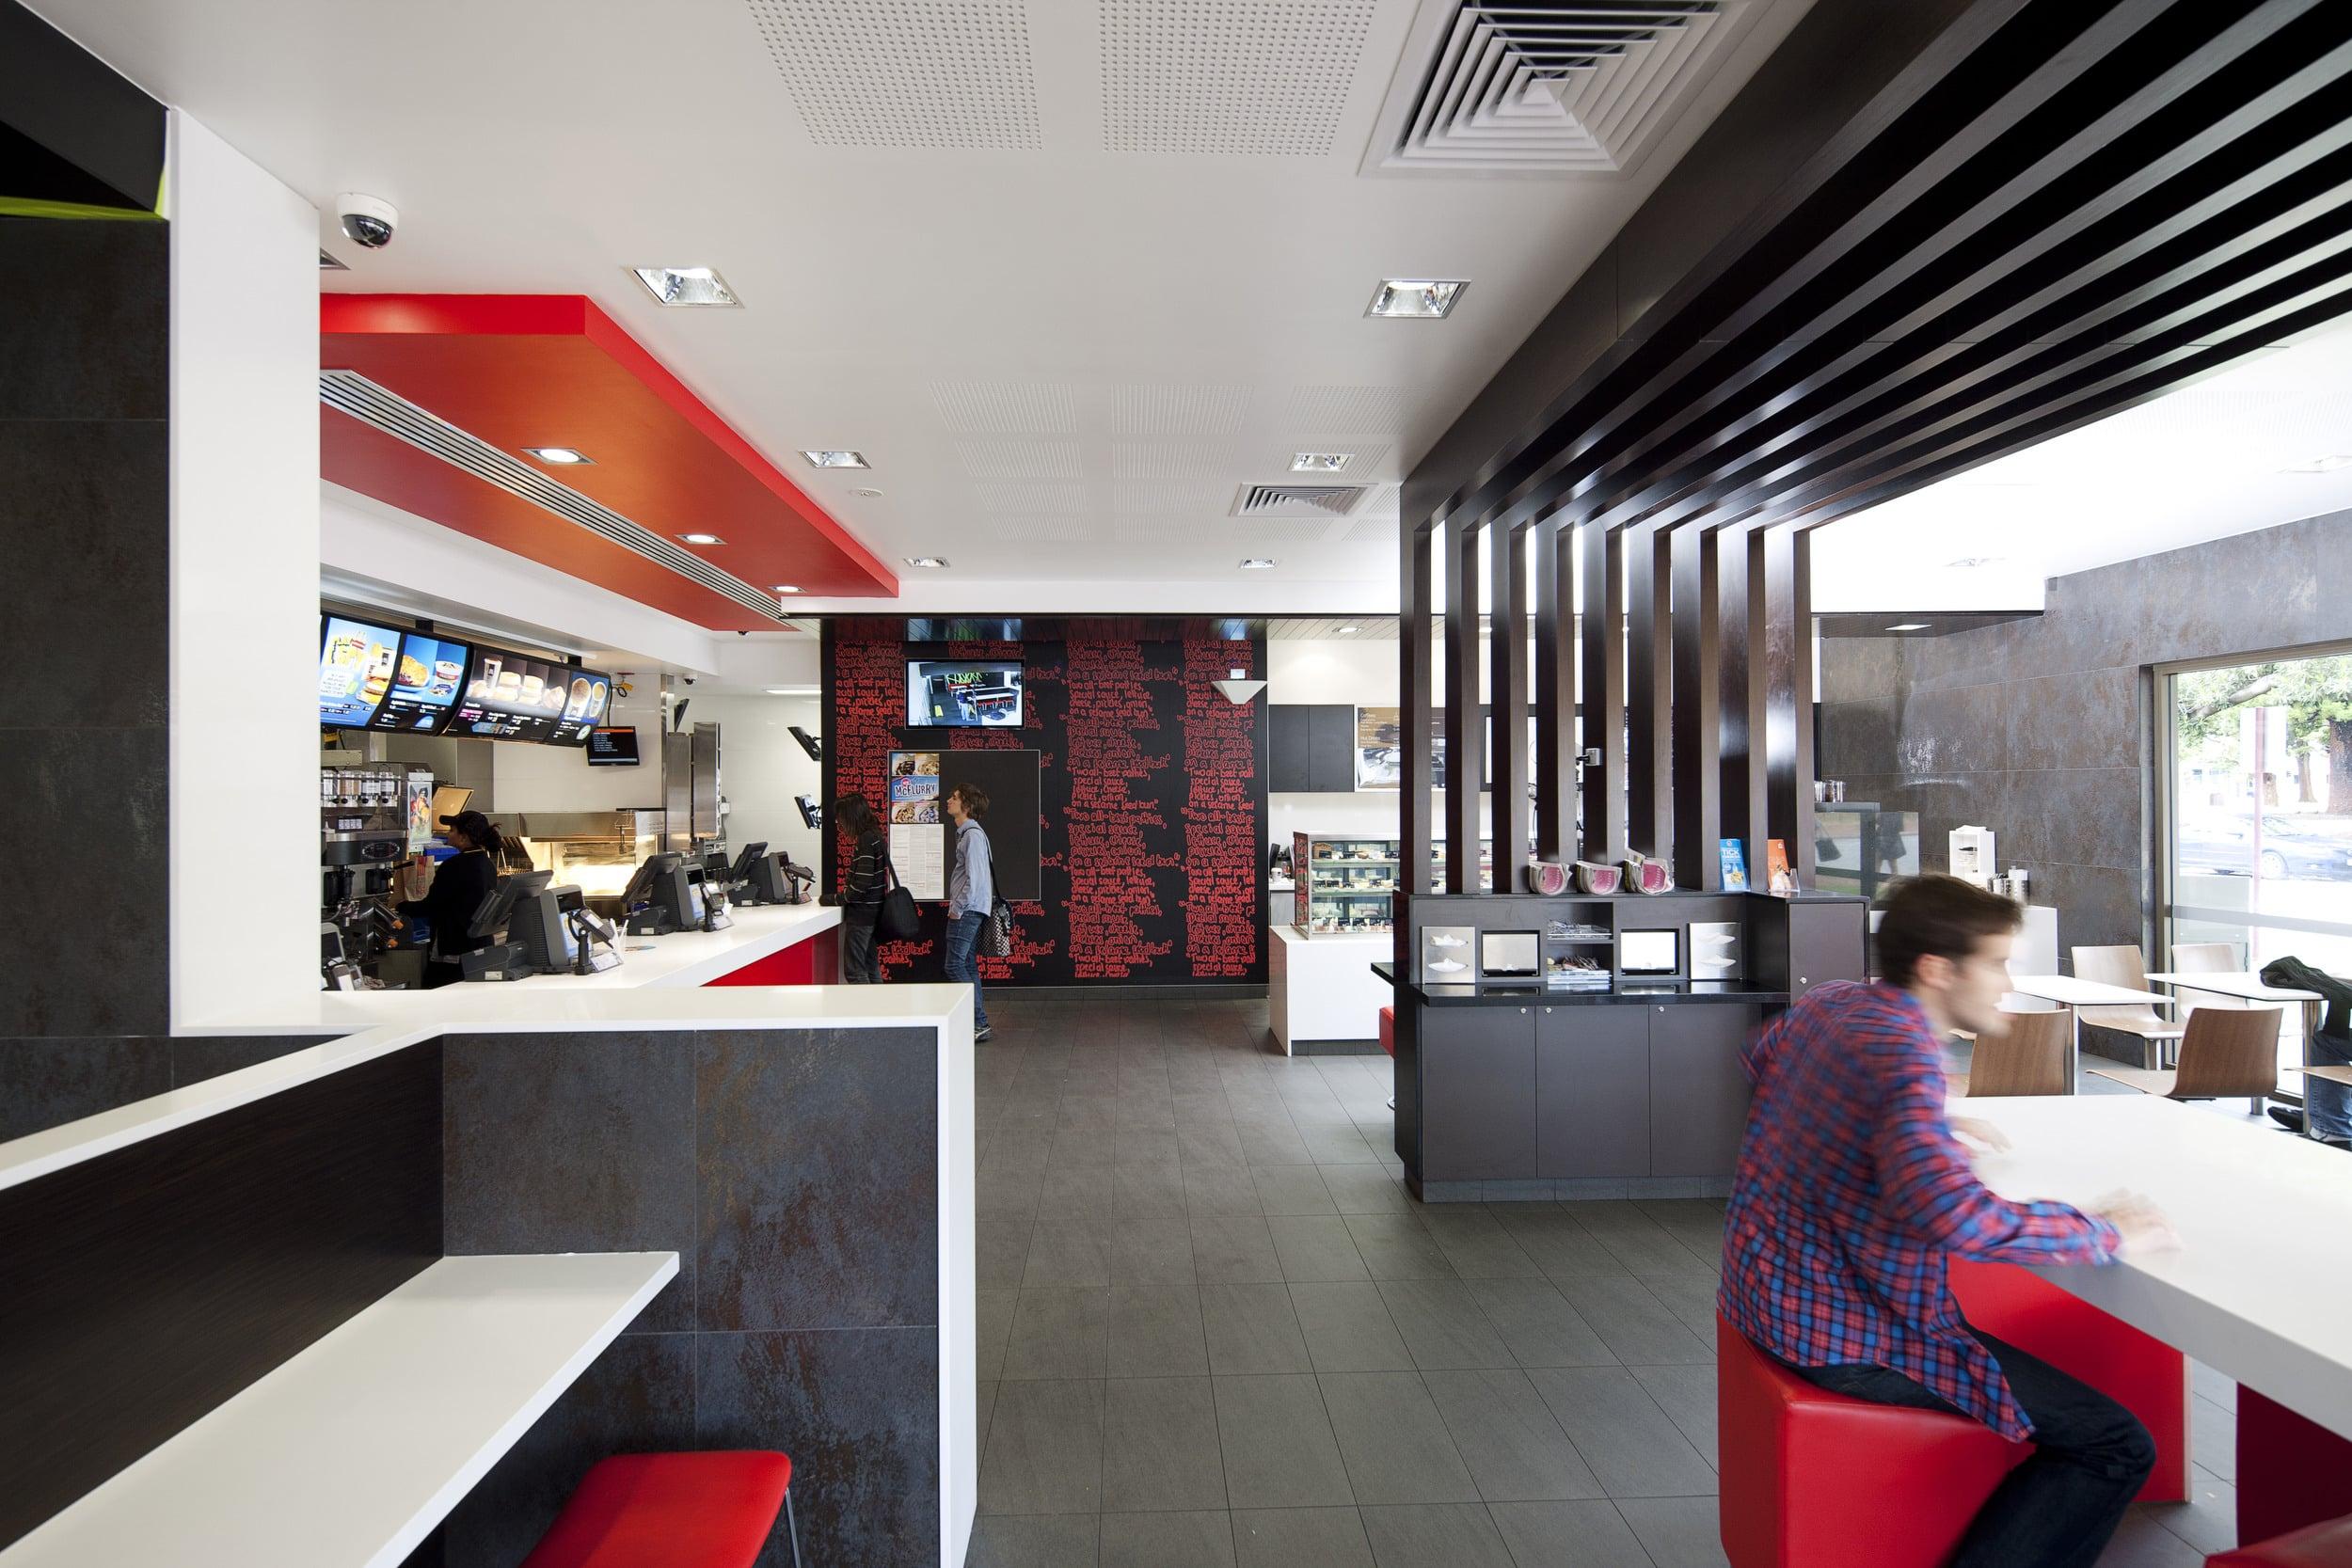 McDonalds20111027_1588